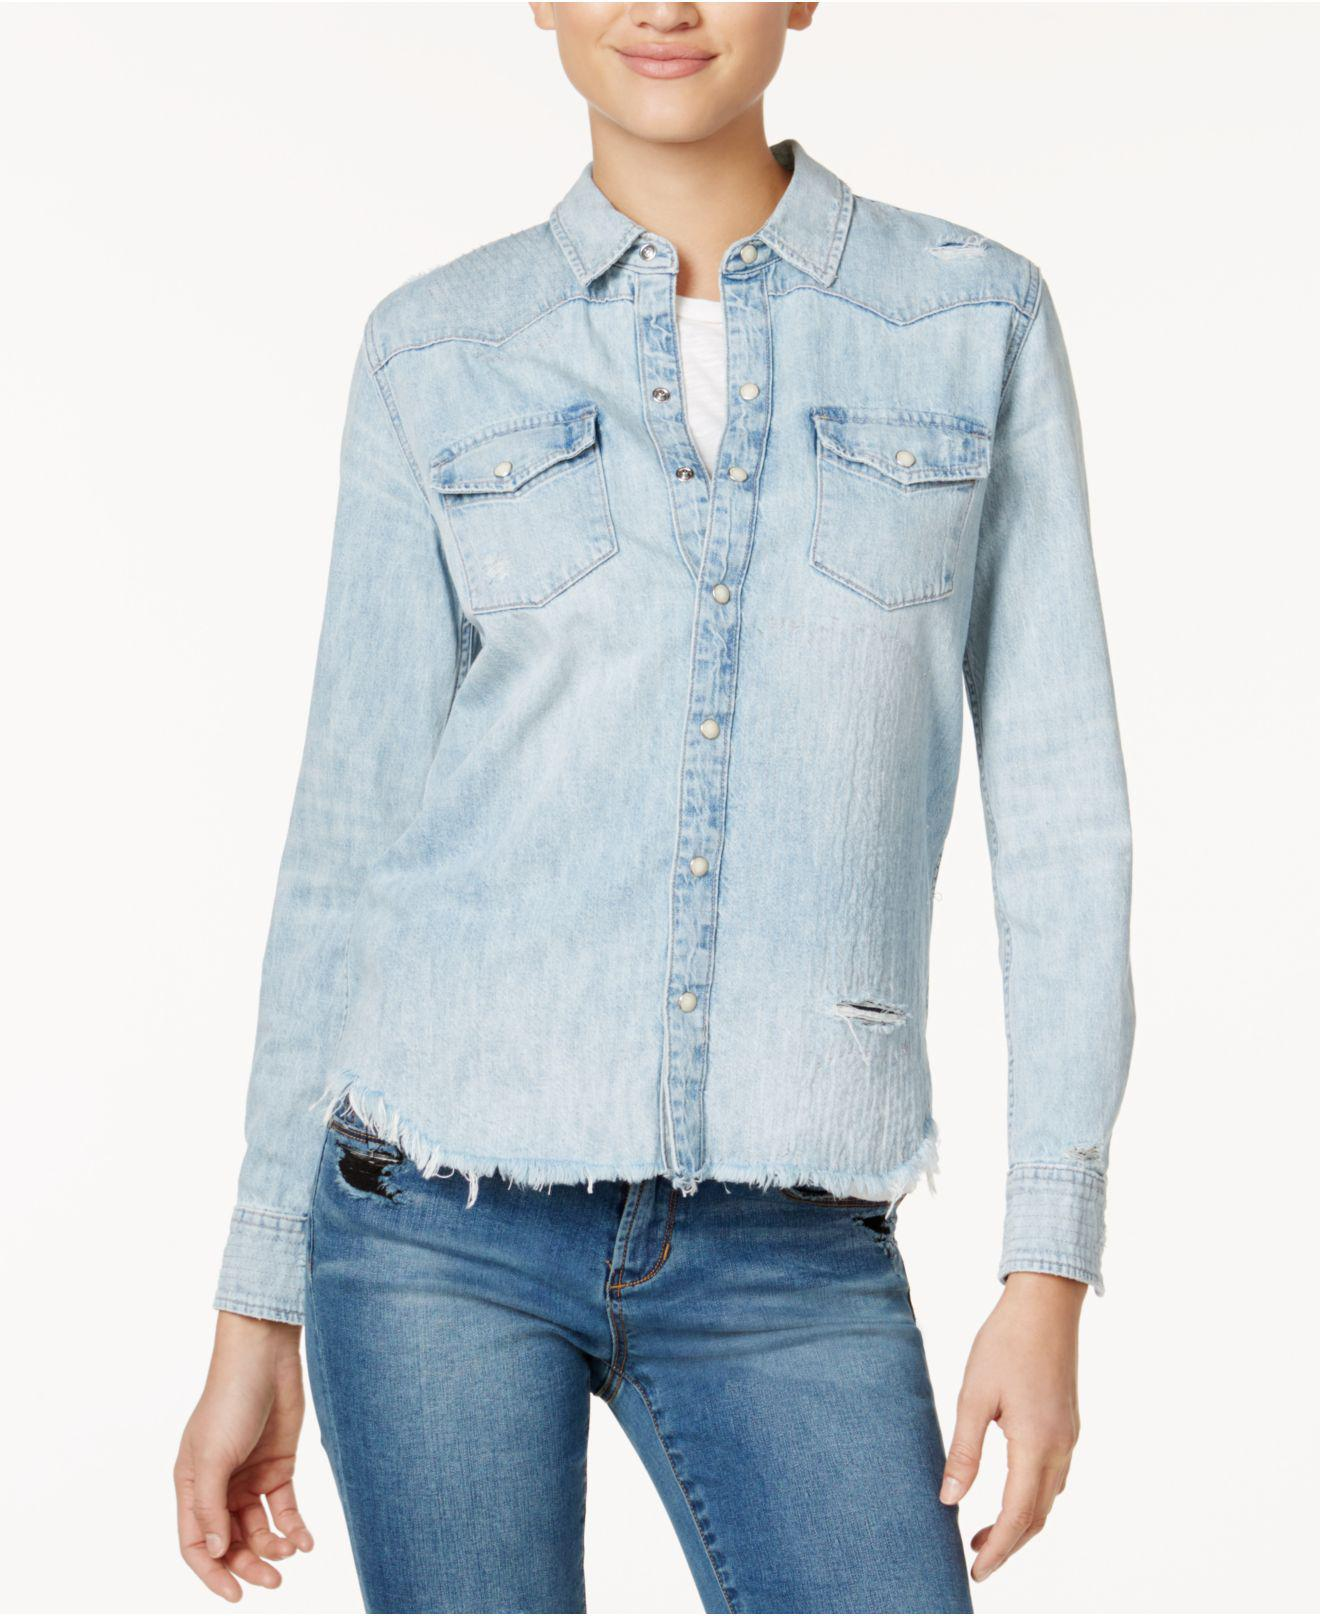 4e993bee85 Lyst - Lucky Brand Cotton Beaded Denim Shirt in Blue